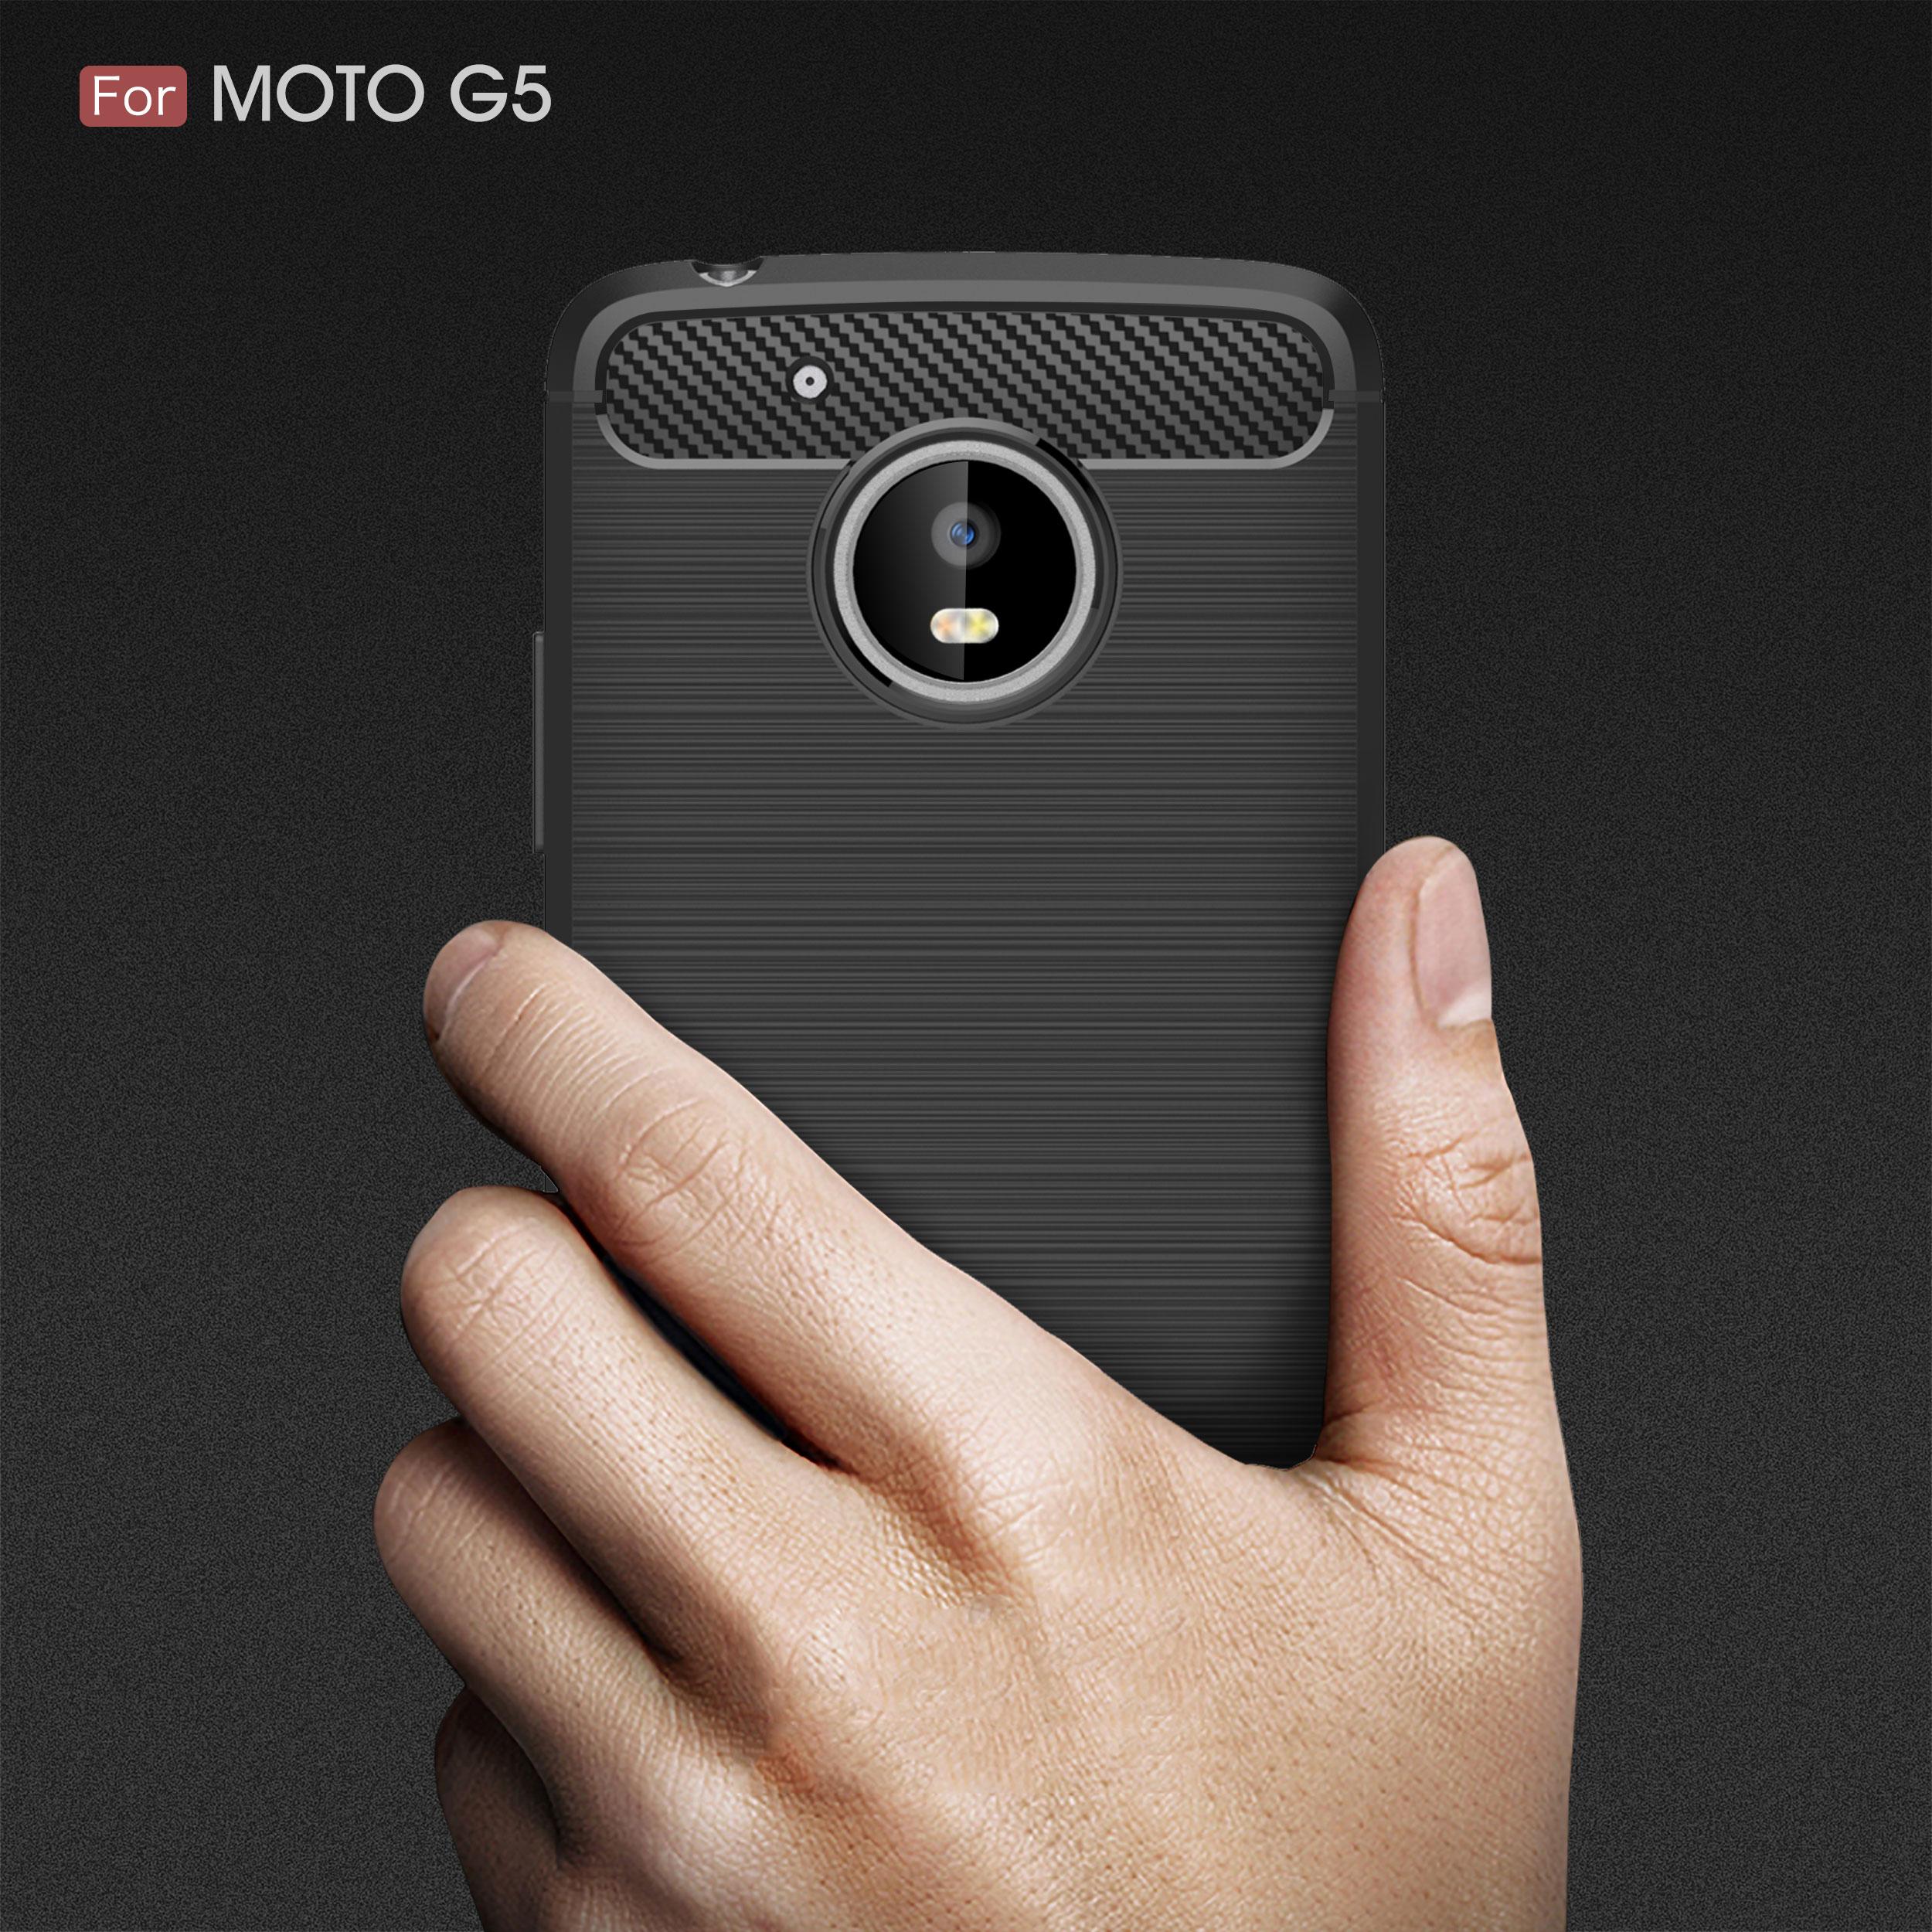 Carbon Fiber Cover Phone Case For Motorola Moto C E4 E5 Z2 G5S Z2 X4 G6 P30 One Note Power Play GO Plus Back Cover Case Coque